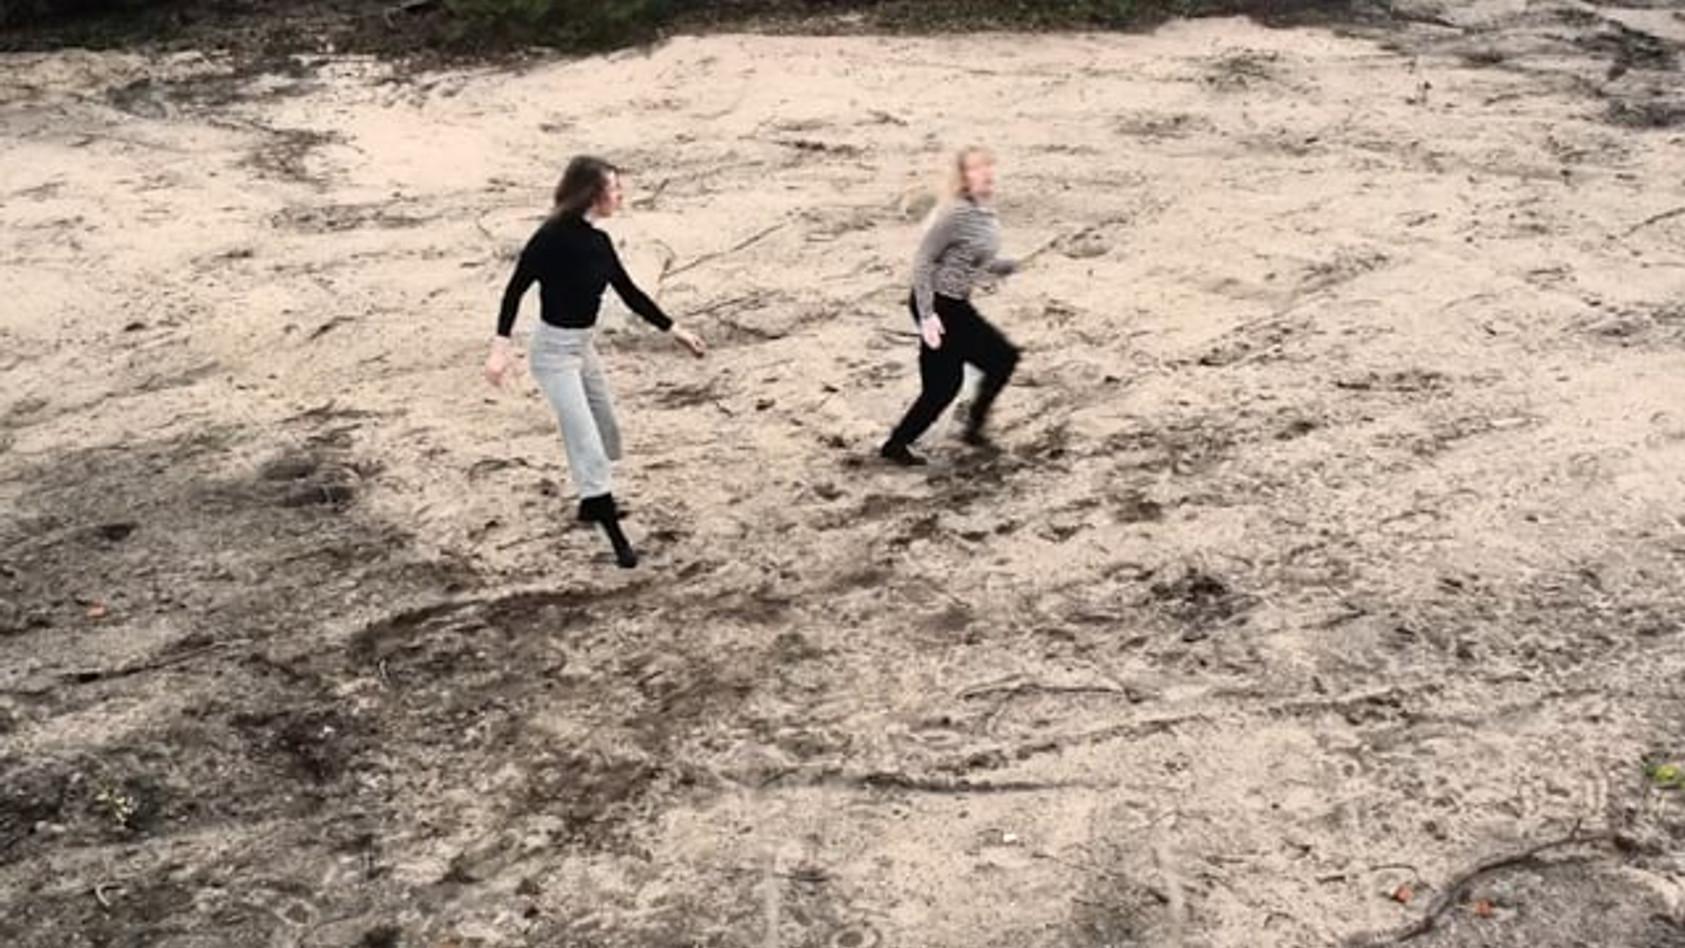 Sleepwalking choreo/dance